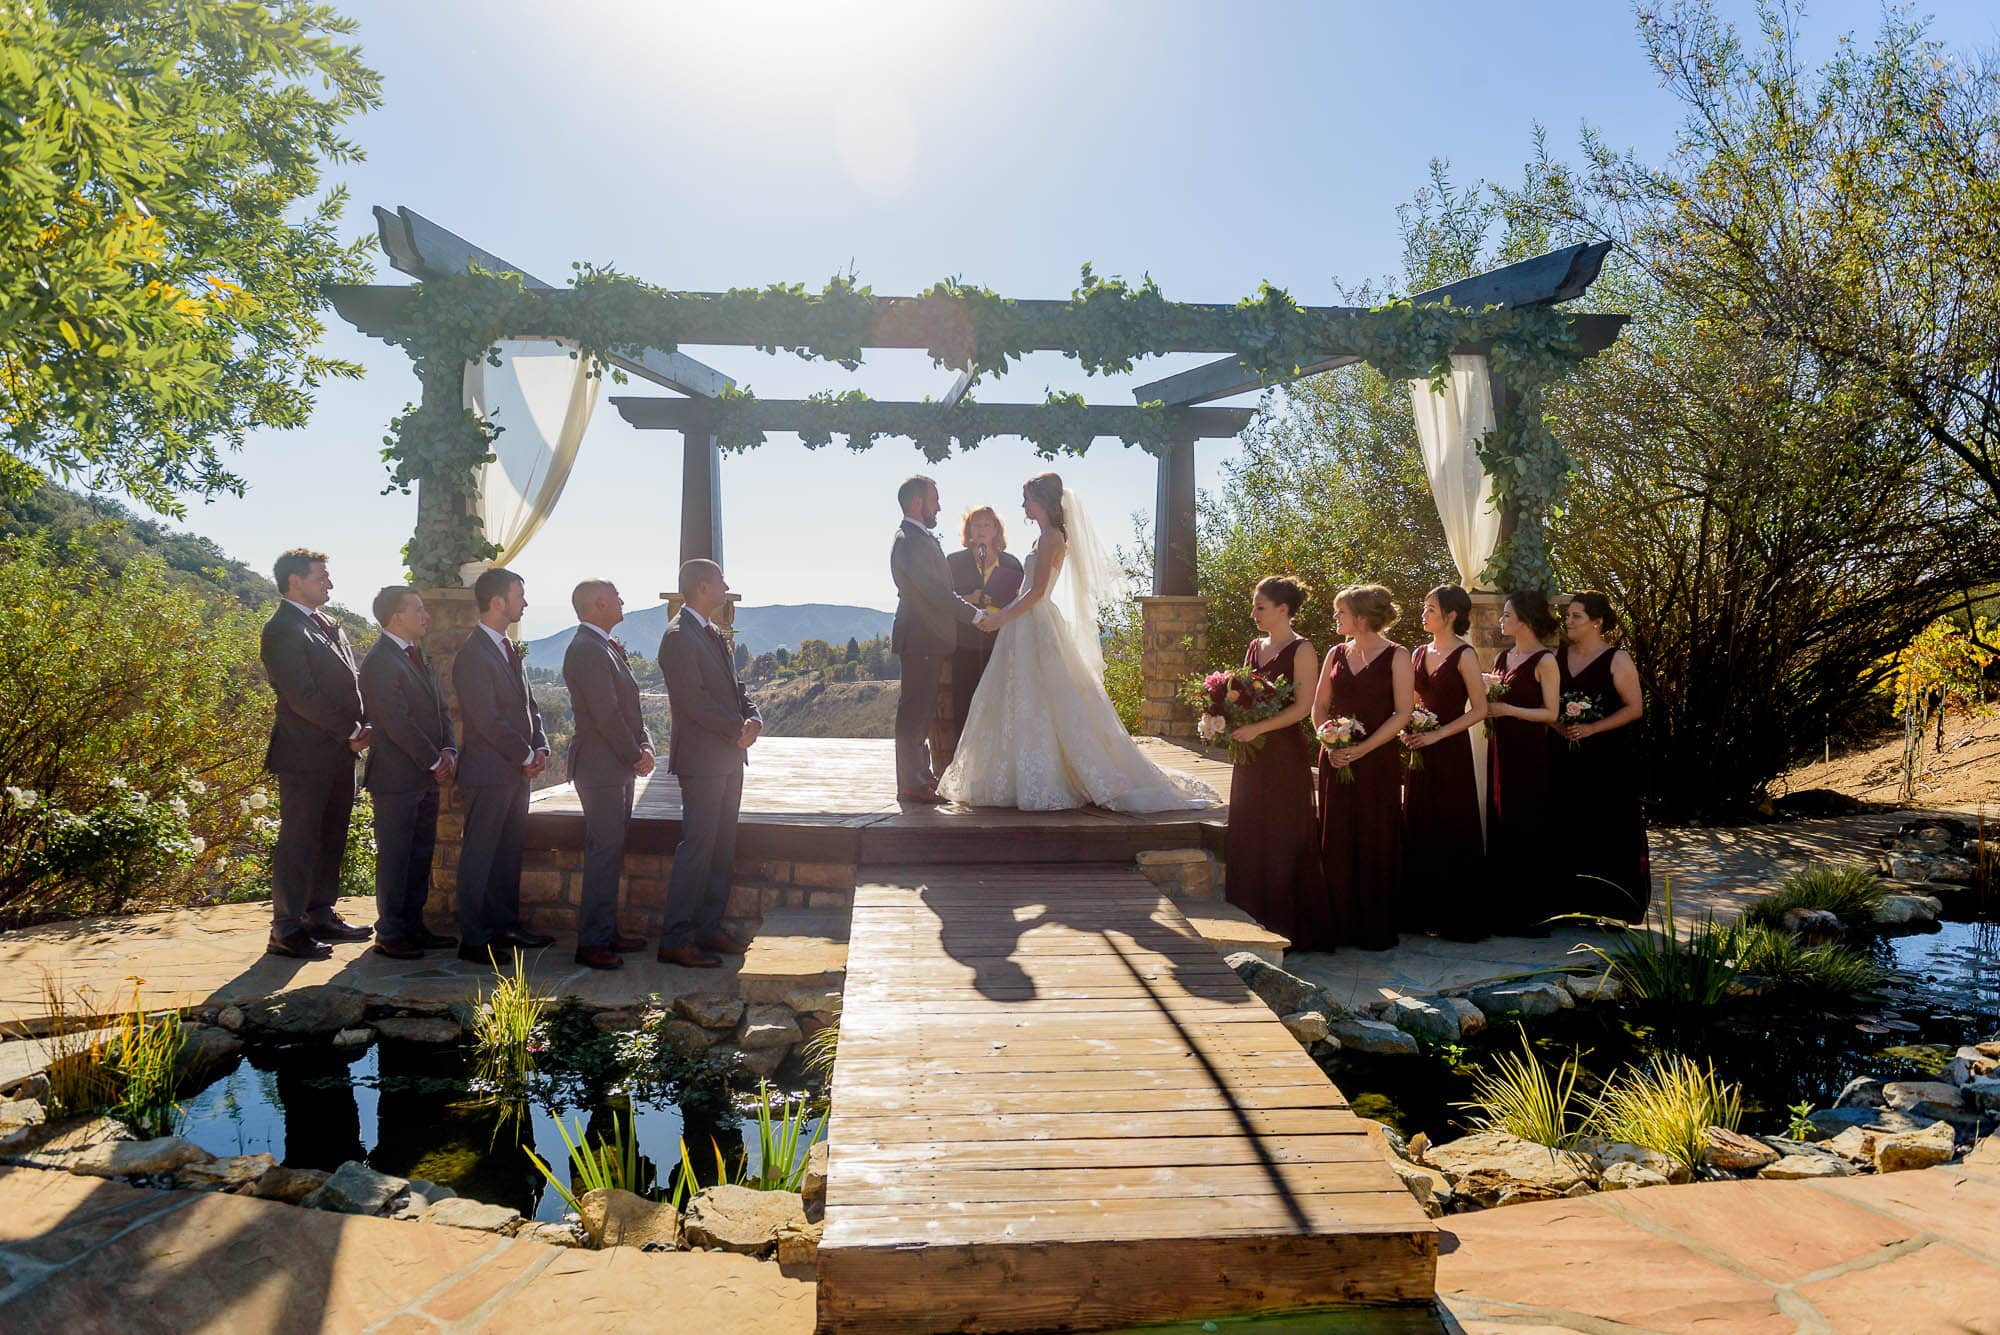 190_Alan_and_Heidi_Serendipity_Garden_Wedding_10-27-2018